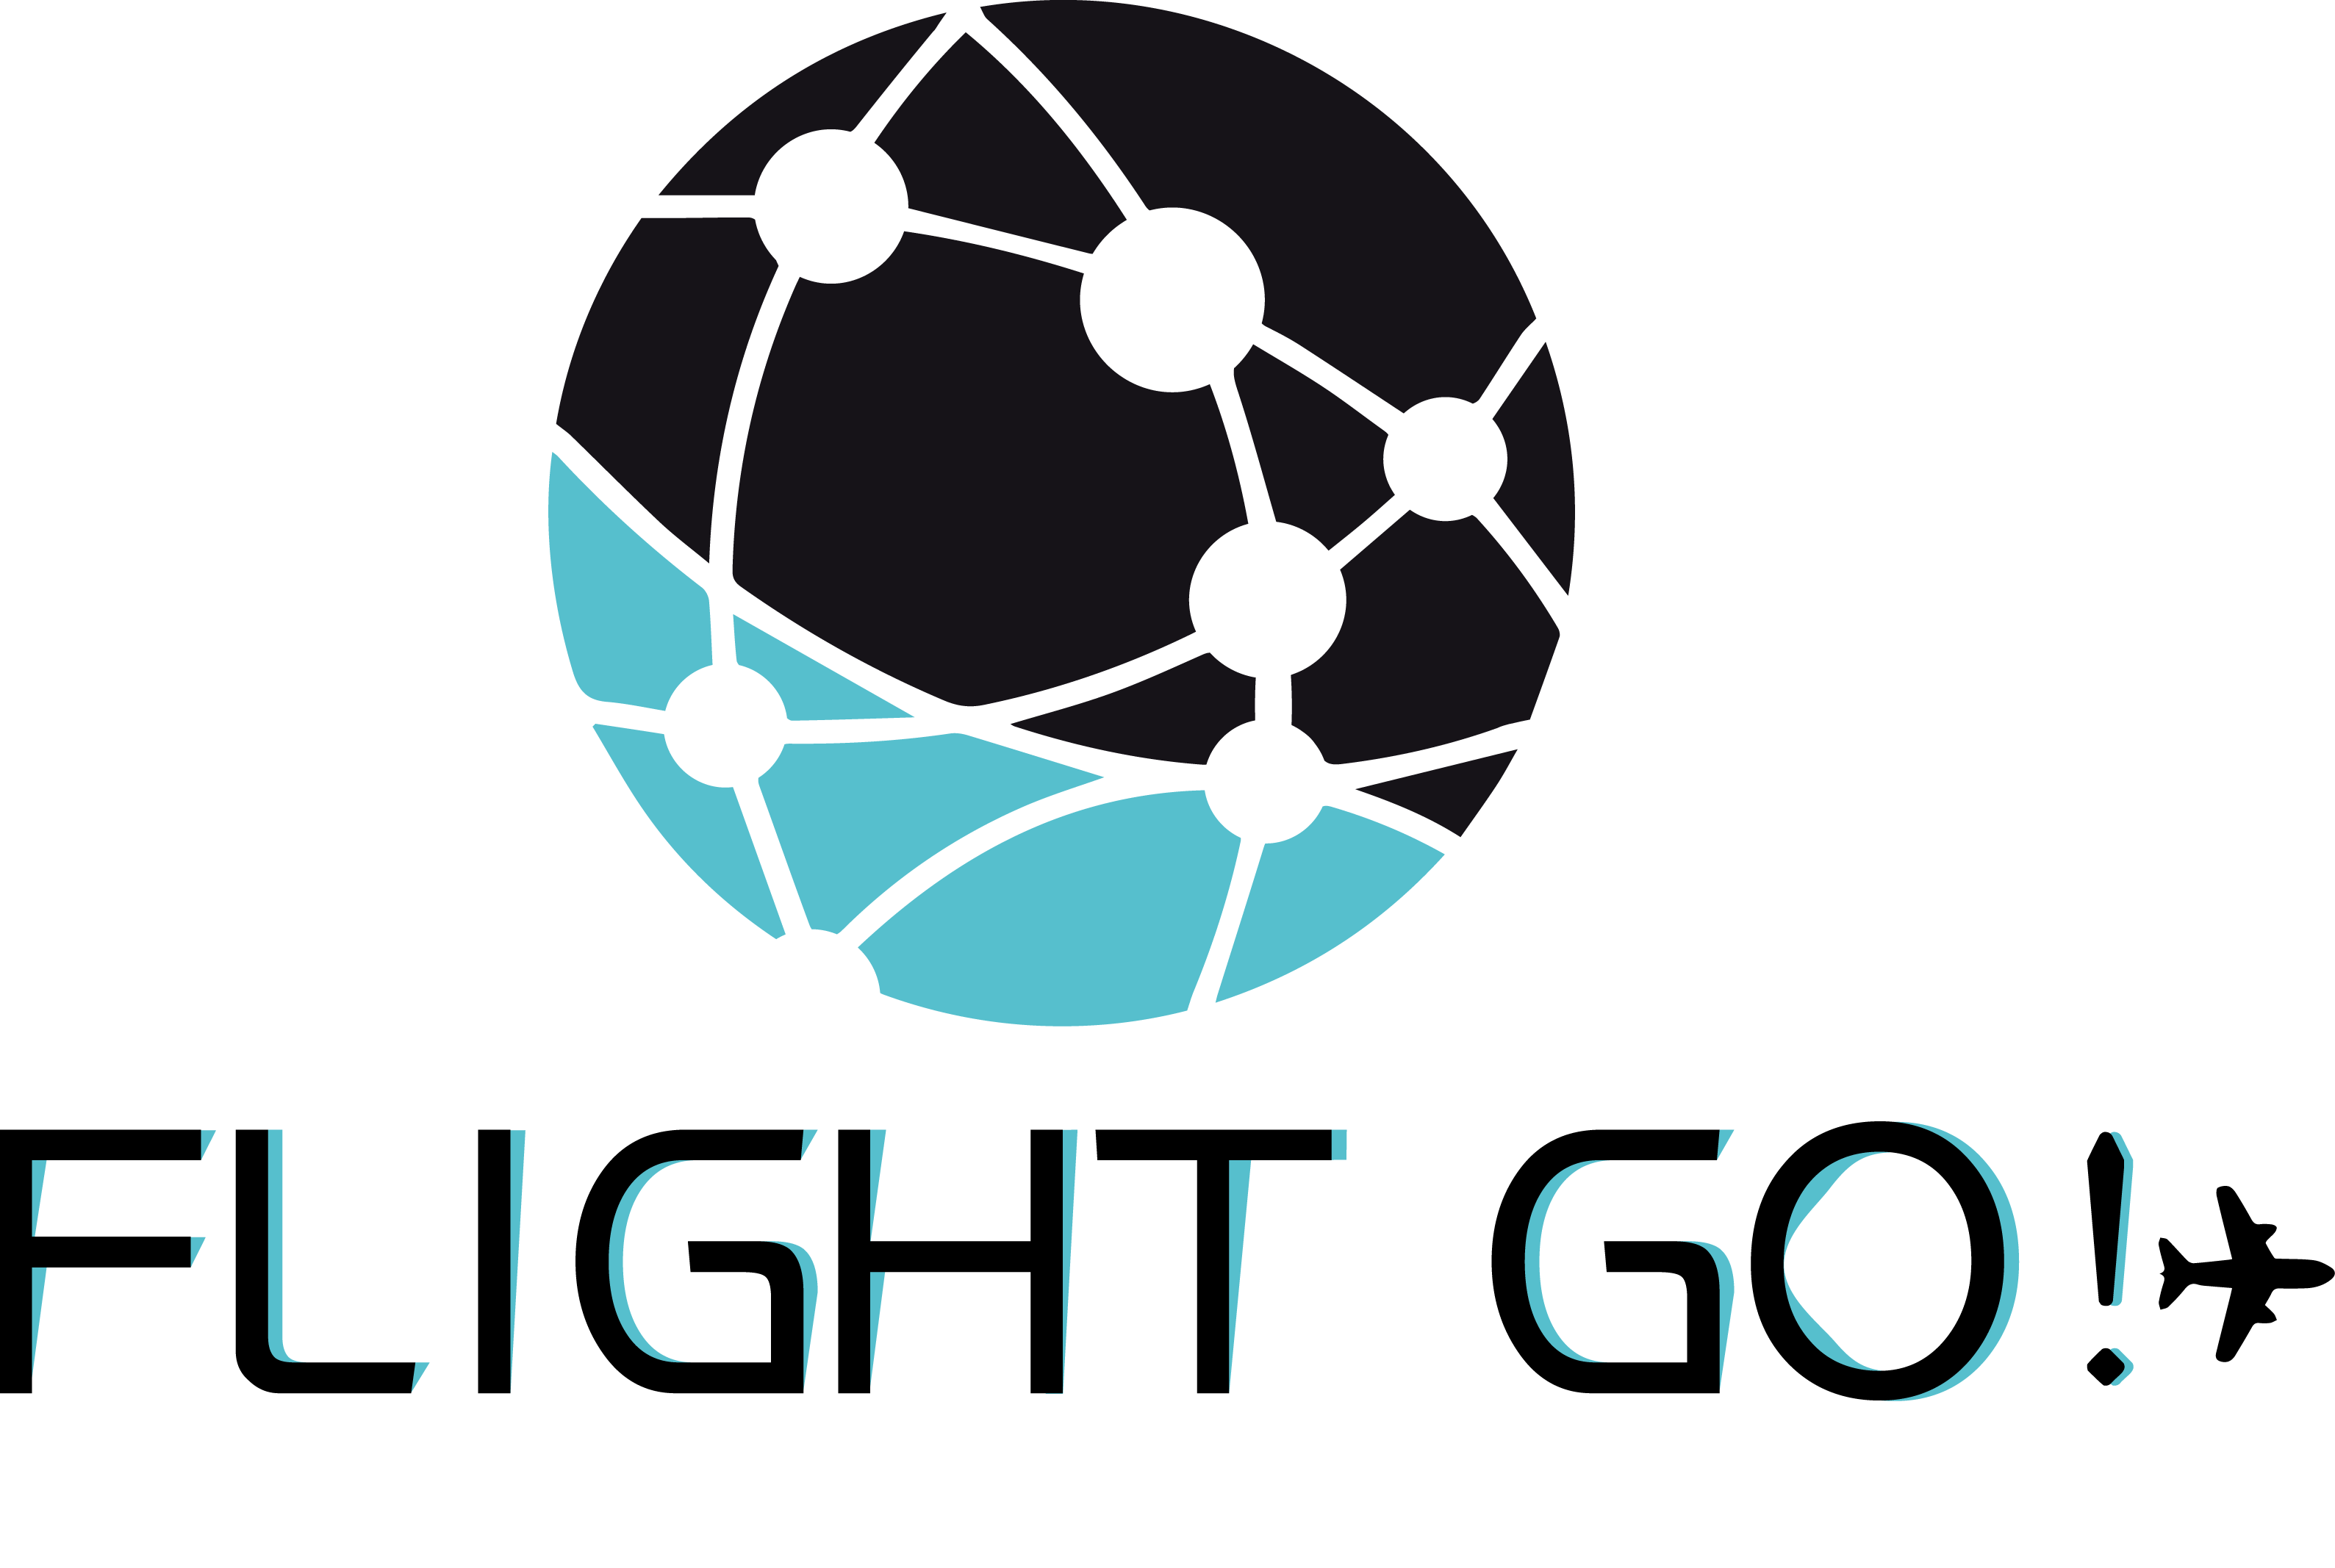 Flightgo logo%e5%ad%97 %281%29